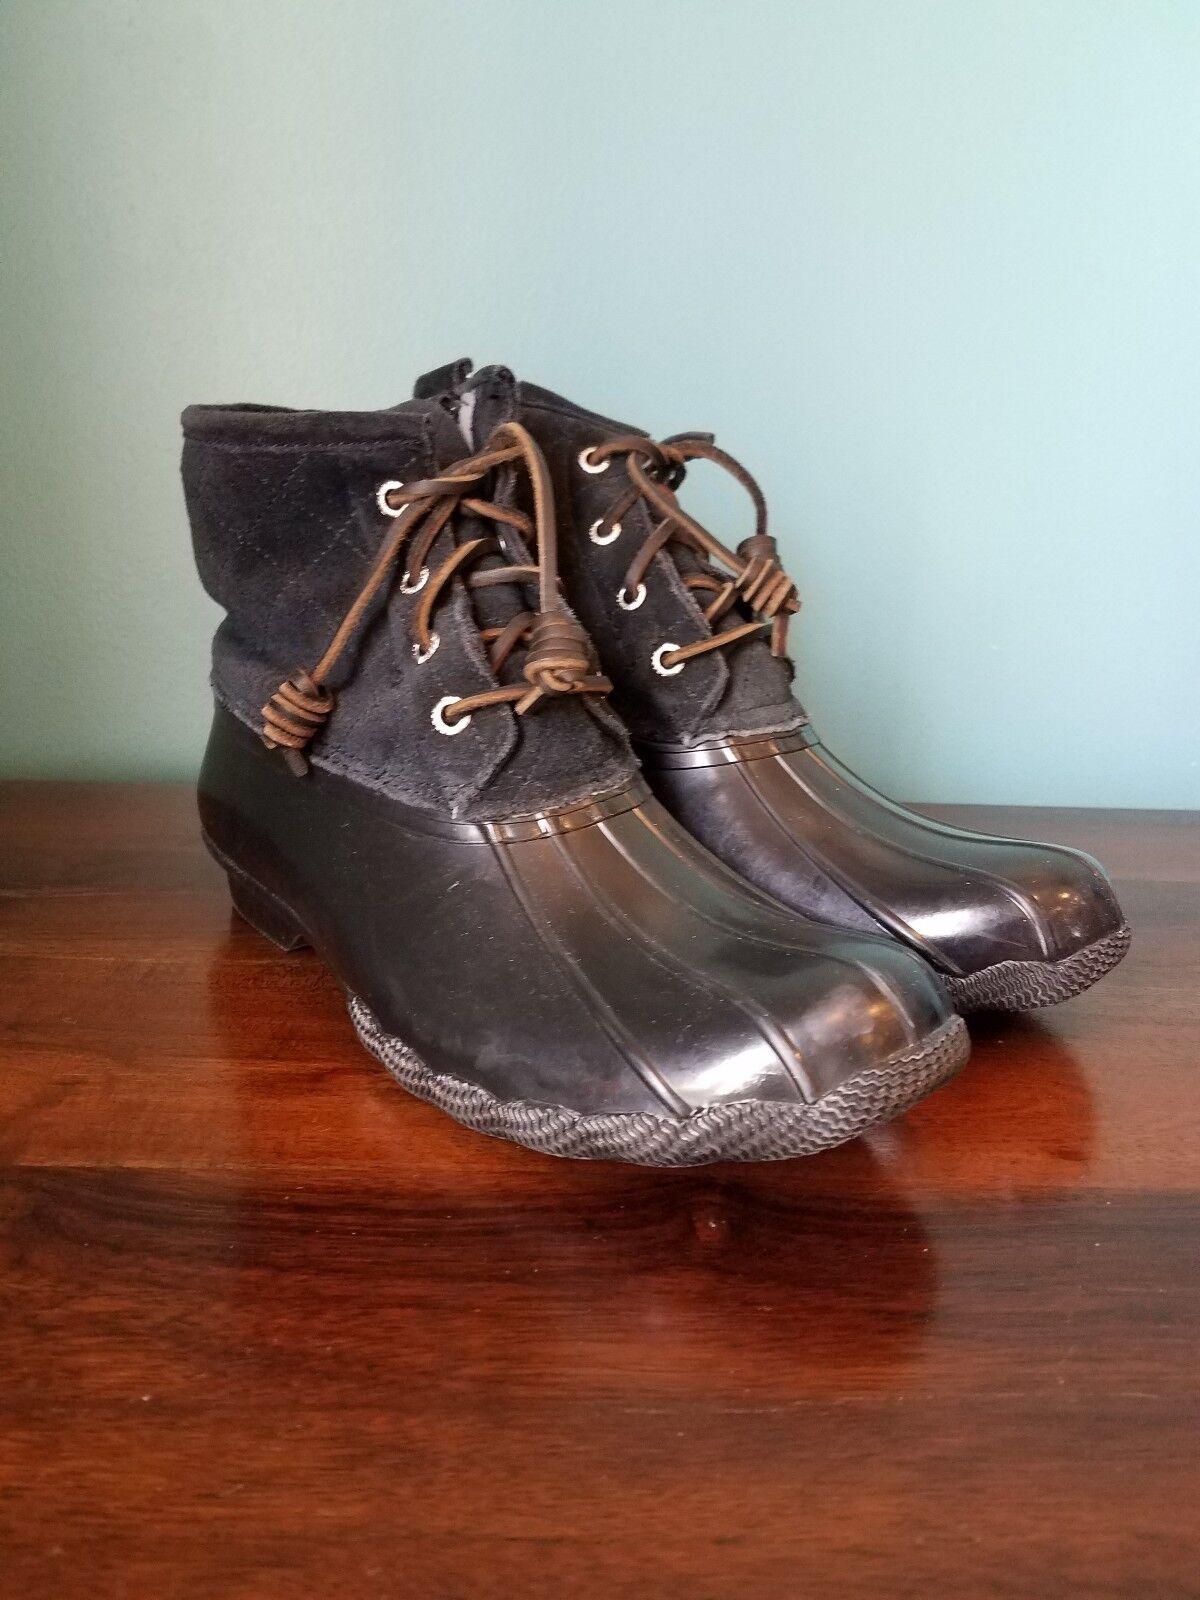 SperryTop-Sider Saltwater Black Quilted Side Zip Duck Duck Duck Boots Women's Size 9 8ac64e